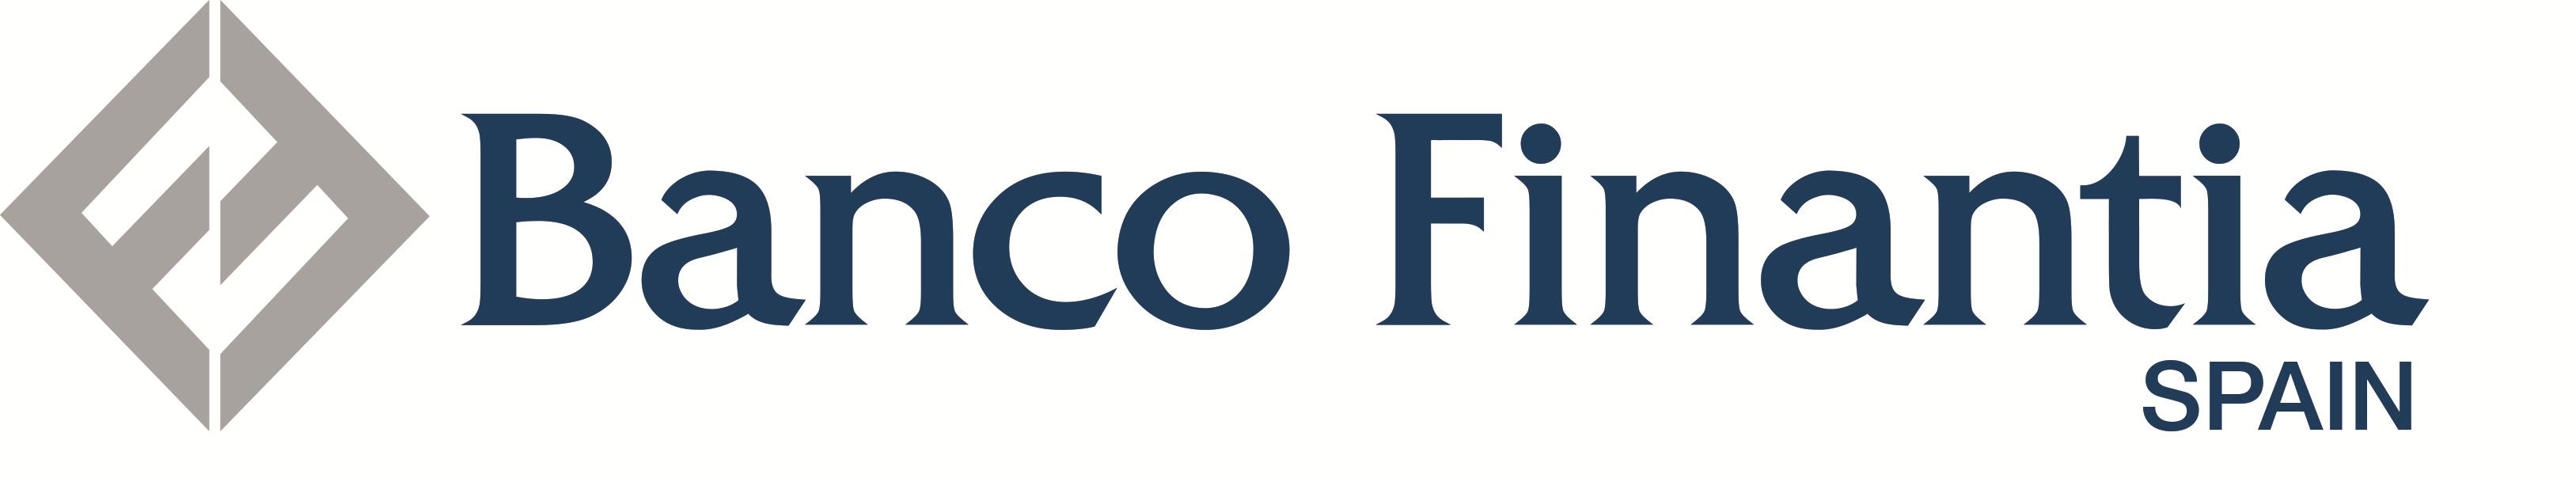 BancoFinantia.SPAIN_logo_CMYK